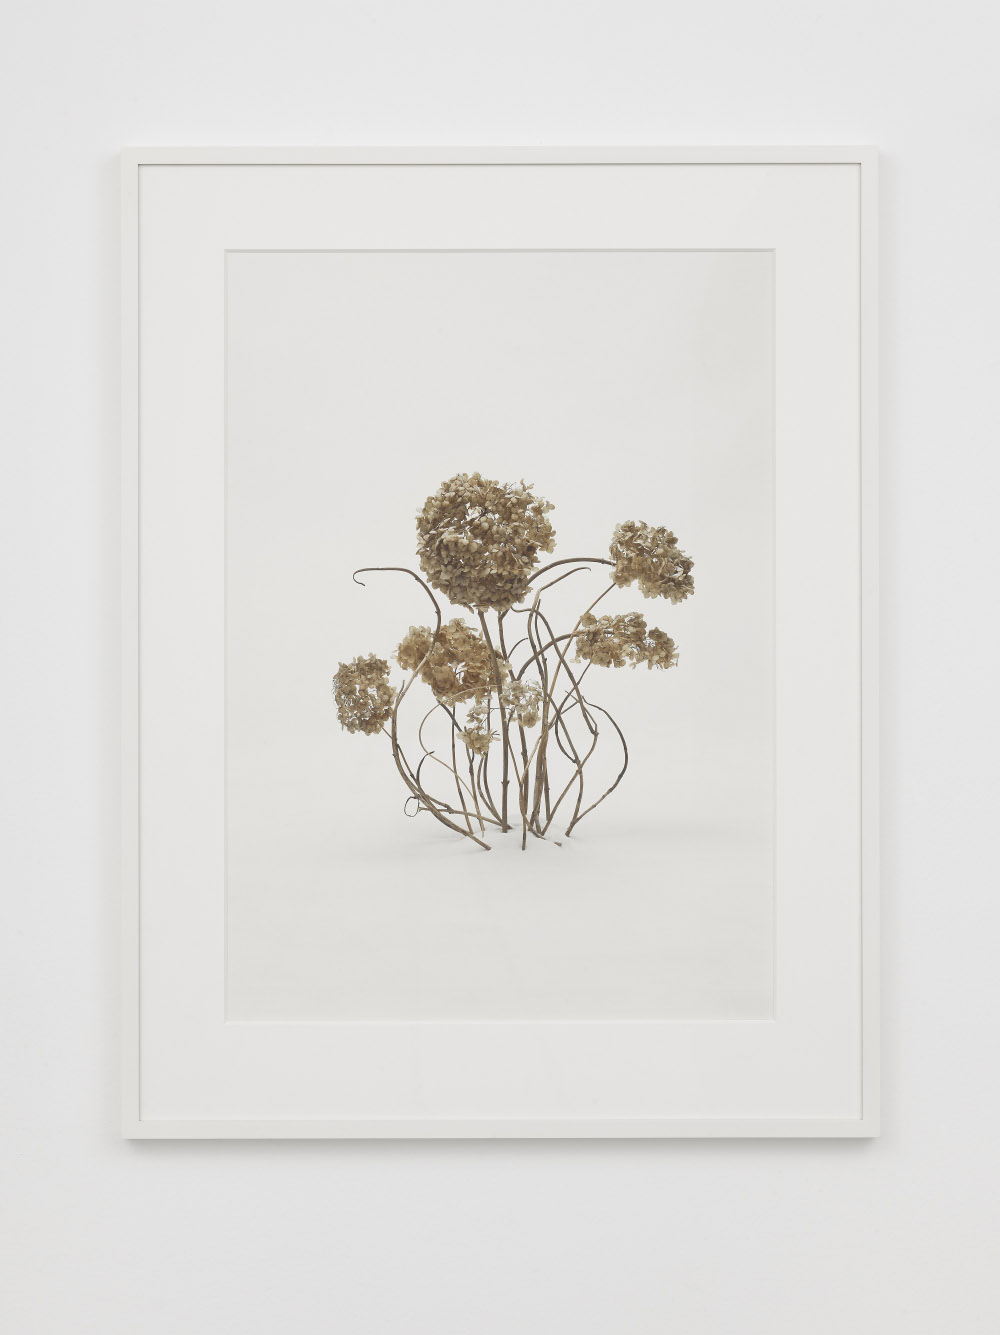 Untitled 5, 2014, digital fine art pigment print,Framed dims. 109.22 x 83.82 x 3.49 cm, Image dims. 85.6 x 61 cm